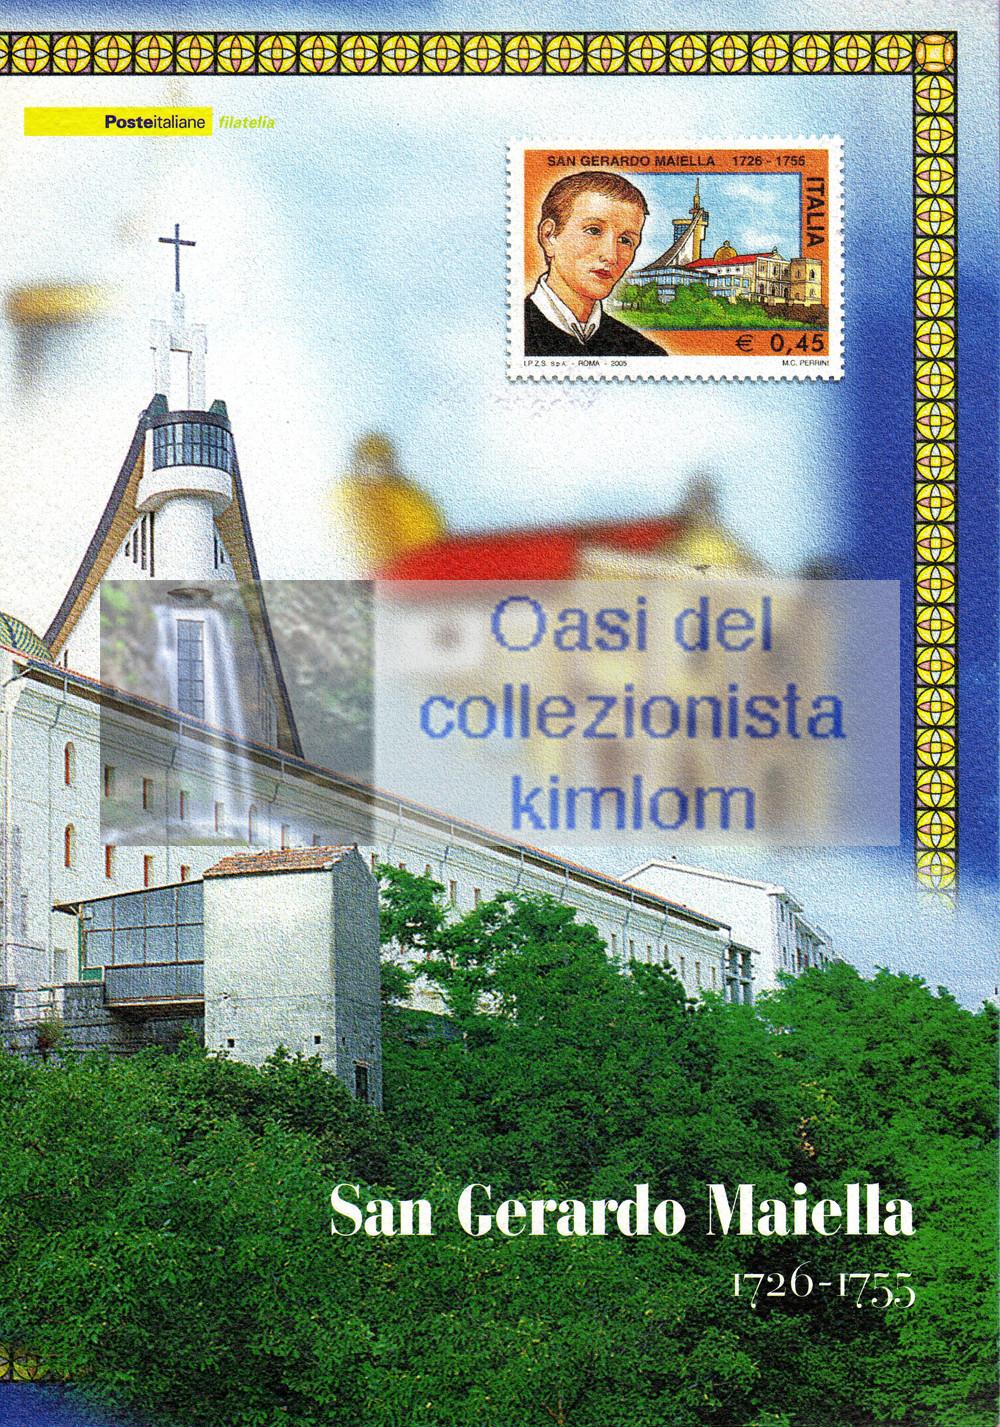 folder - San Gerardo Maiella 1726-1755